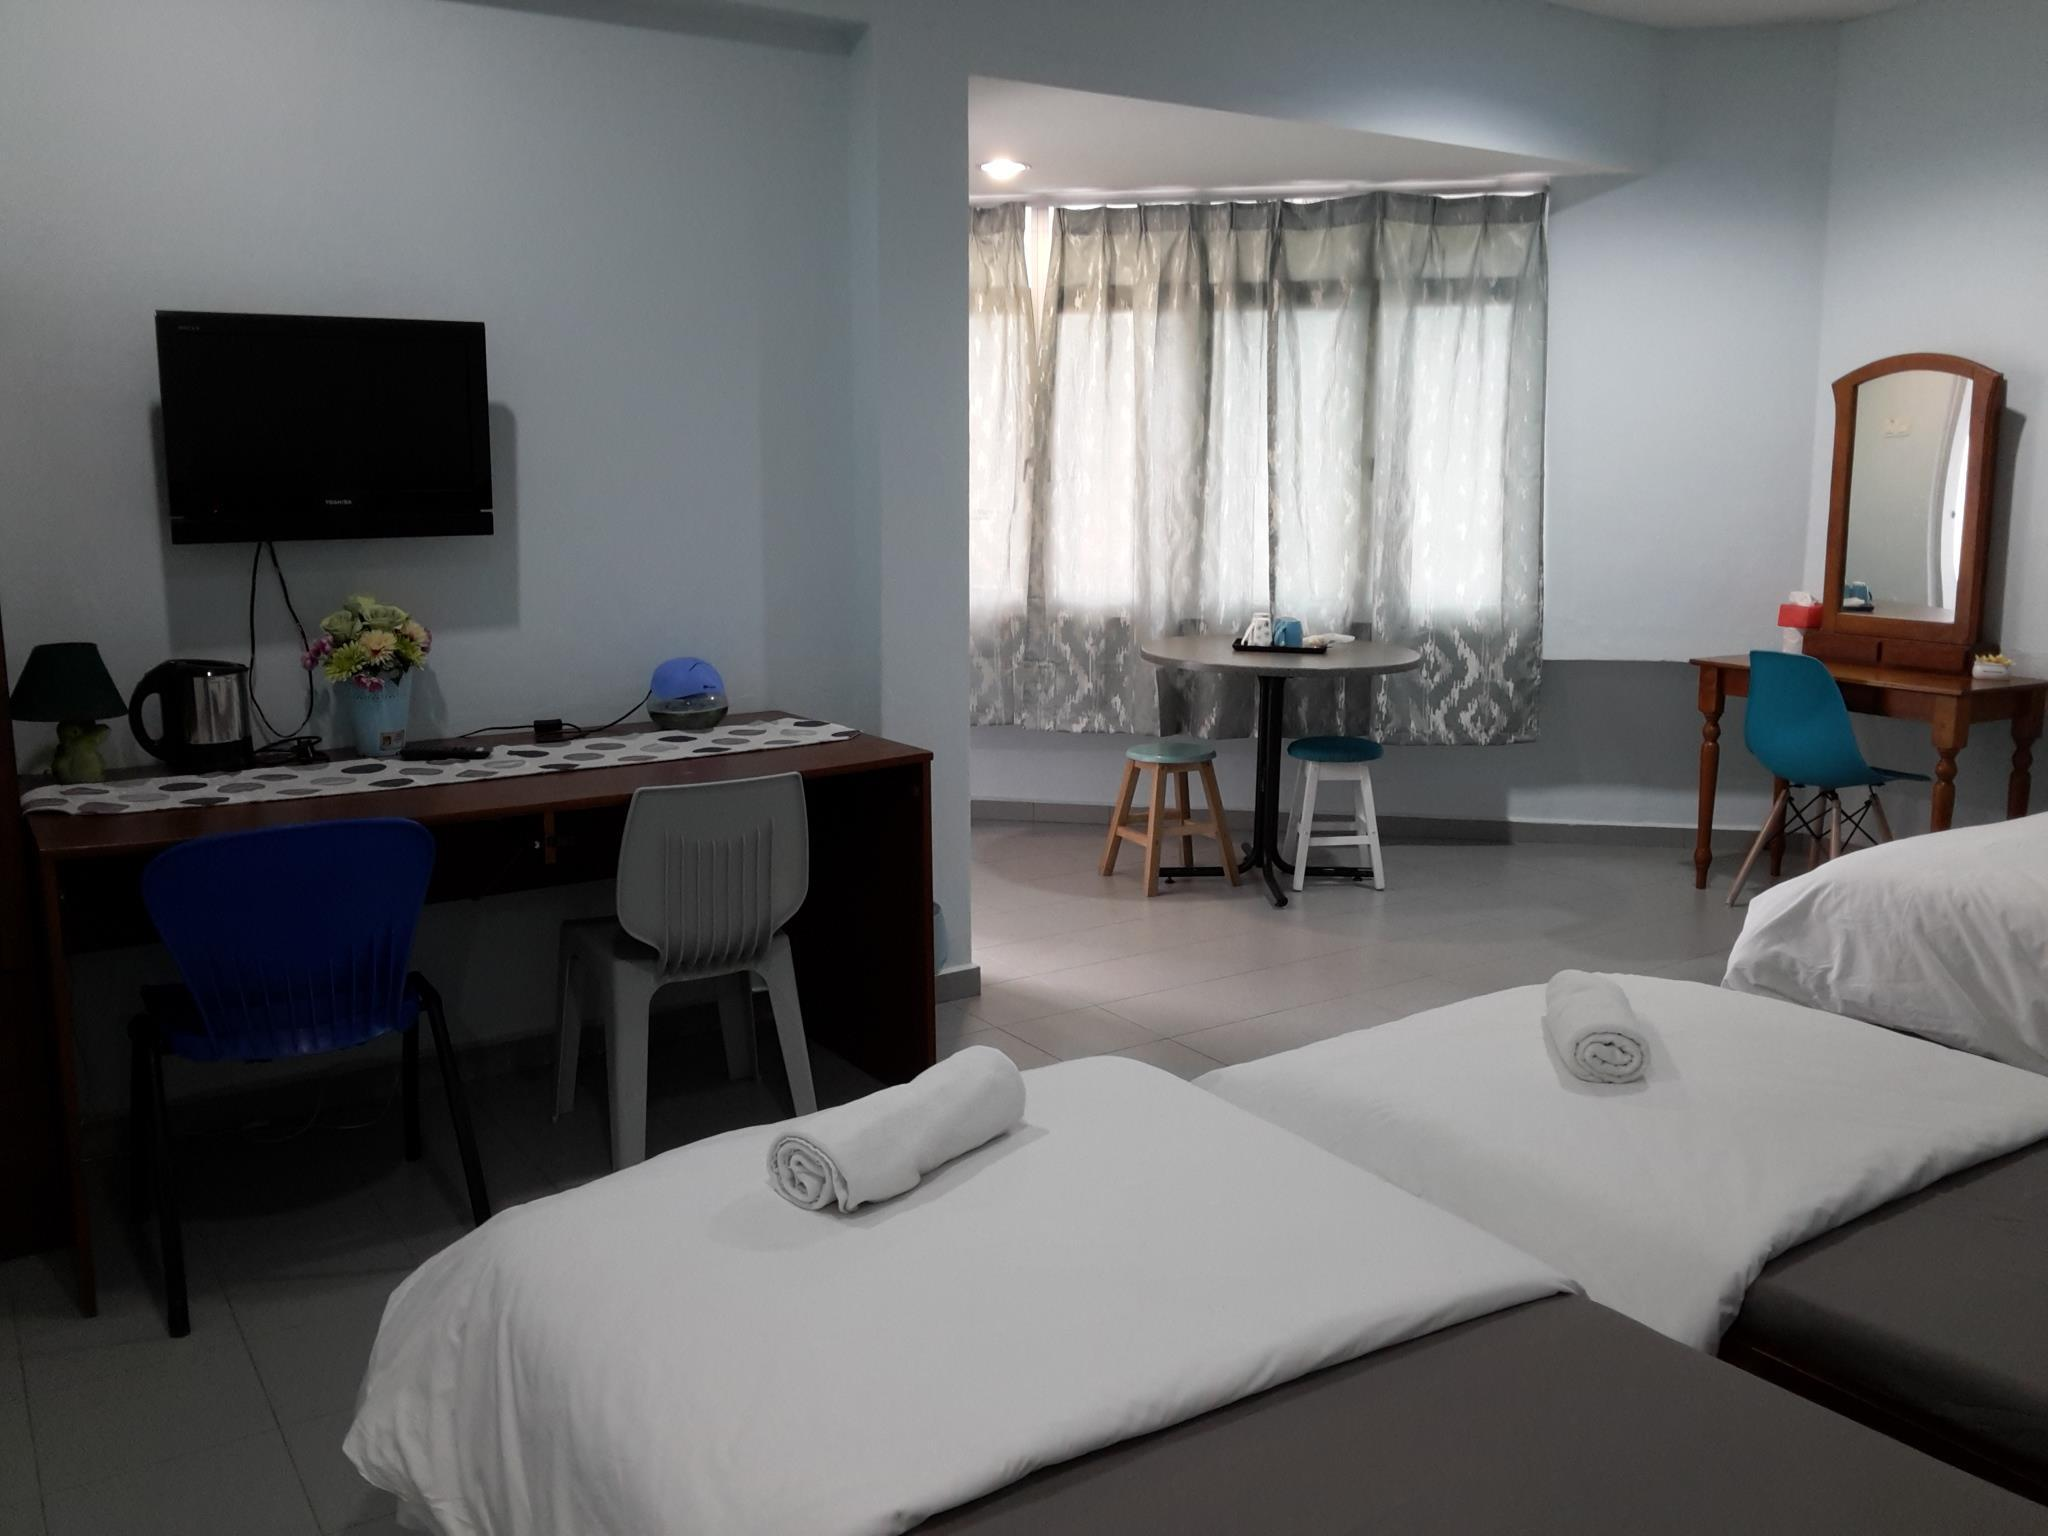 Thoo Hotel, Kota Melaka